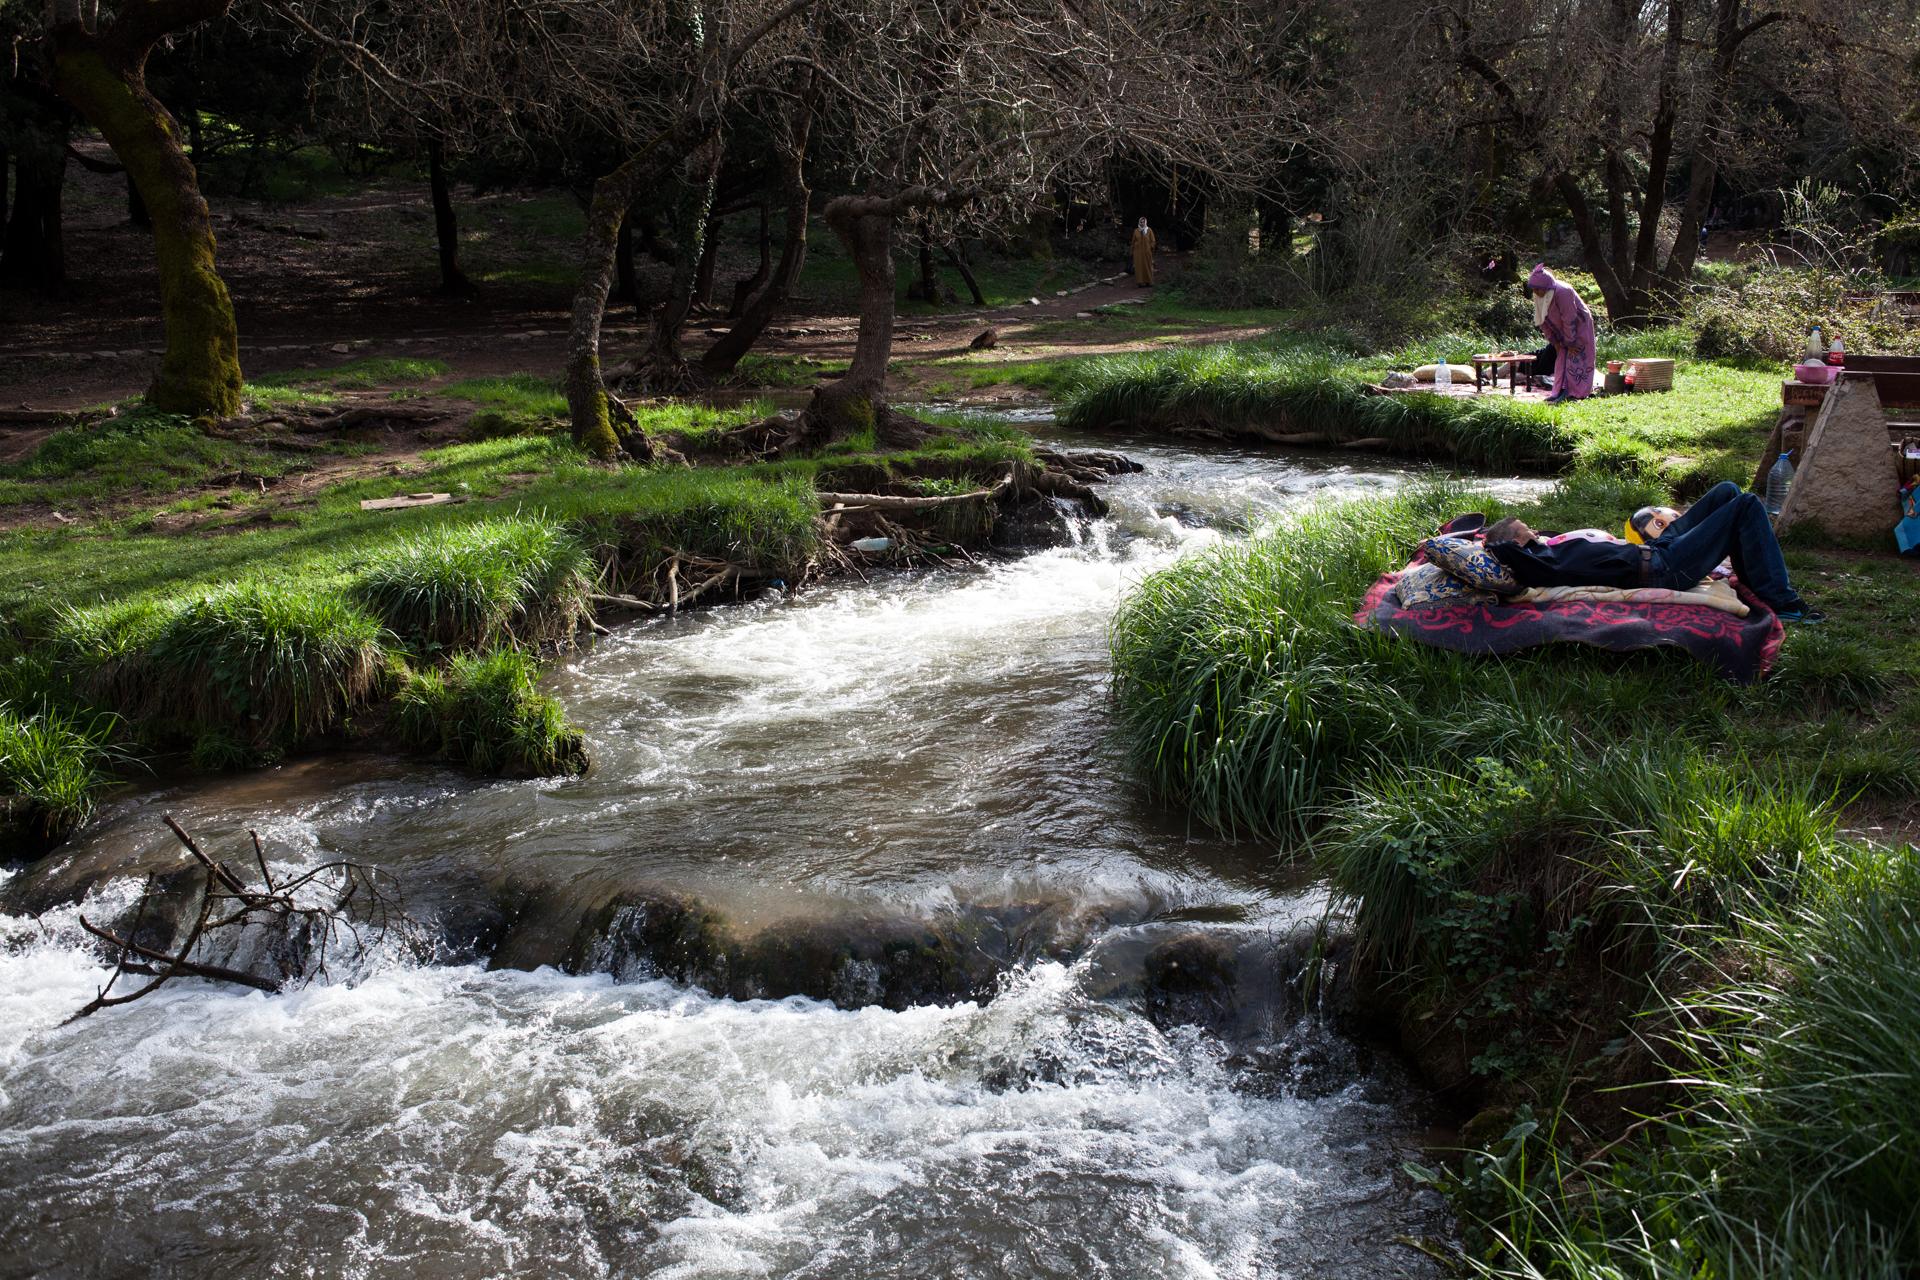 Relaxing near the waterfall